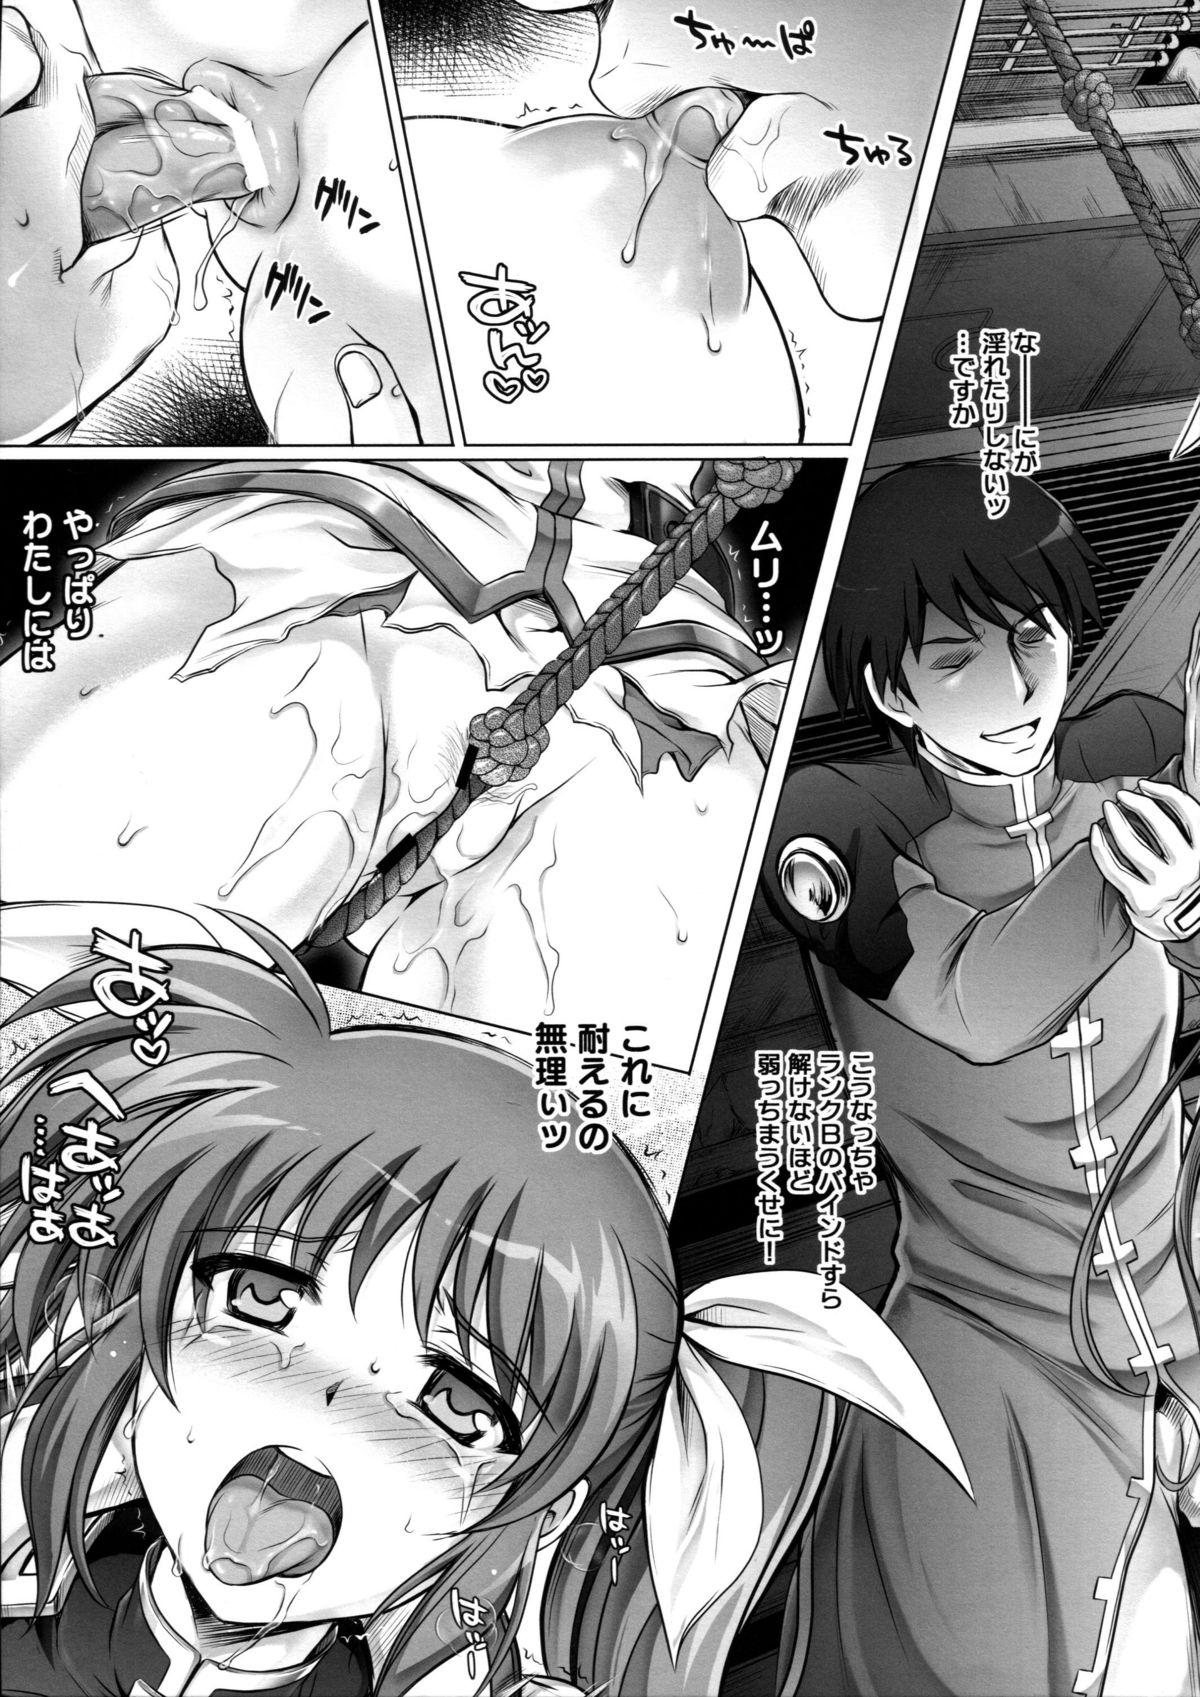 Gokuusu Kahitsuban Takamatic After 4